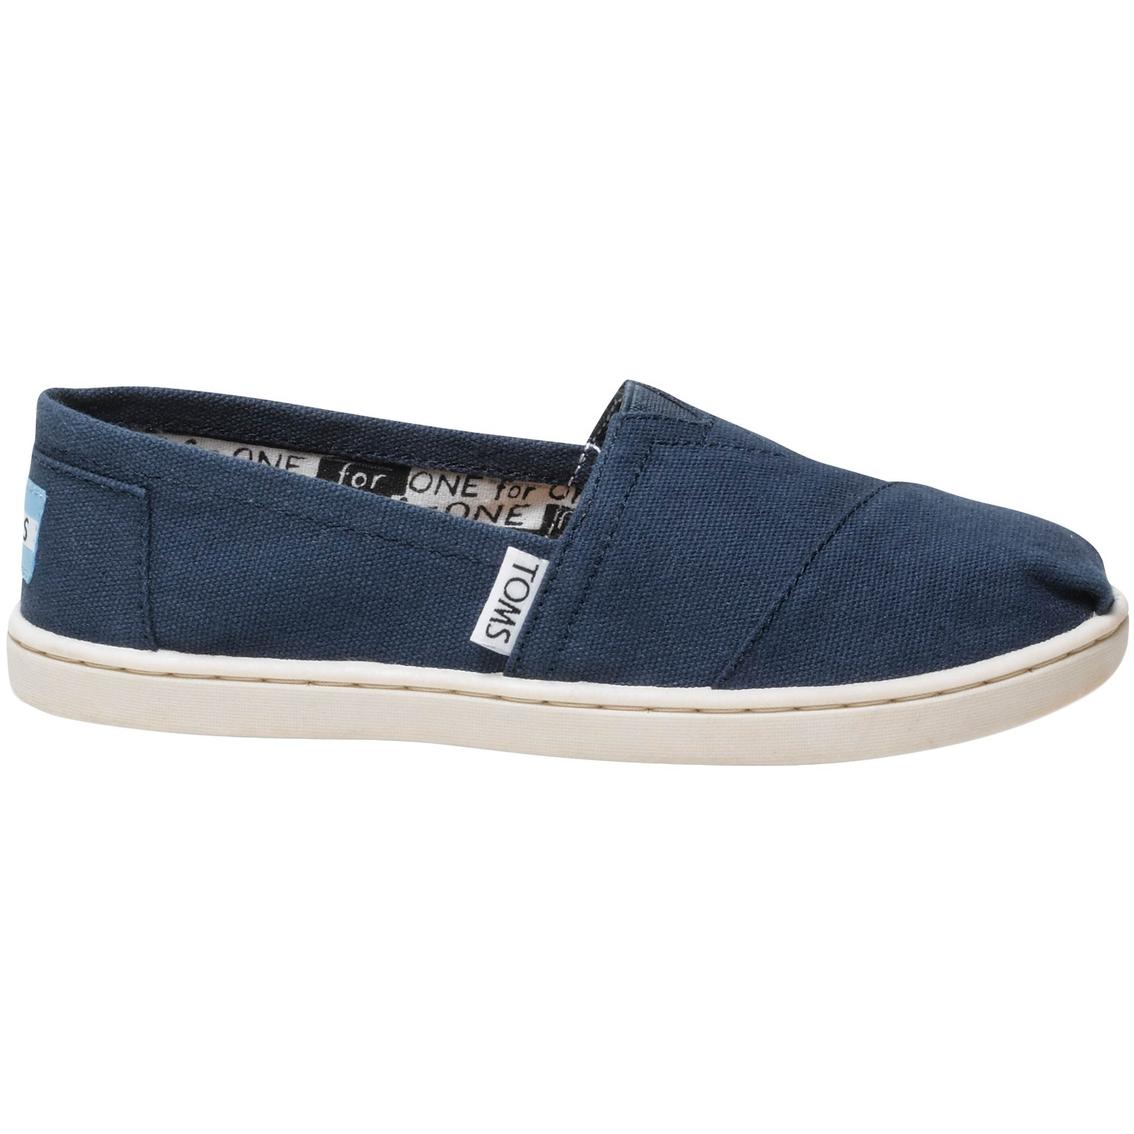 6b19c6aea11 Toms Kids Classic Slip On Shoes